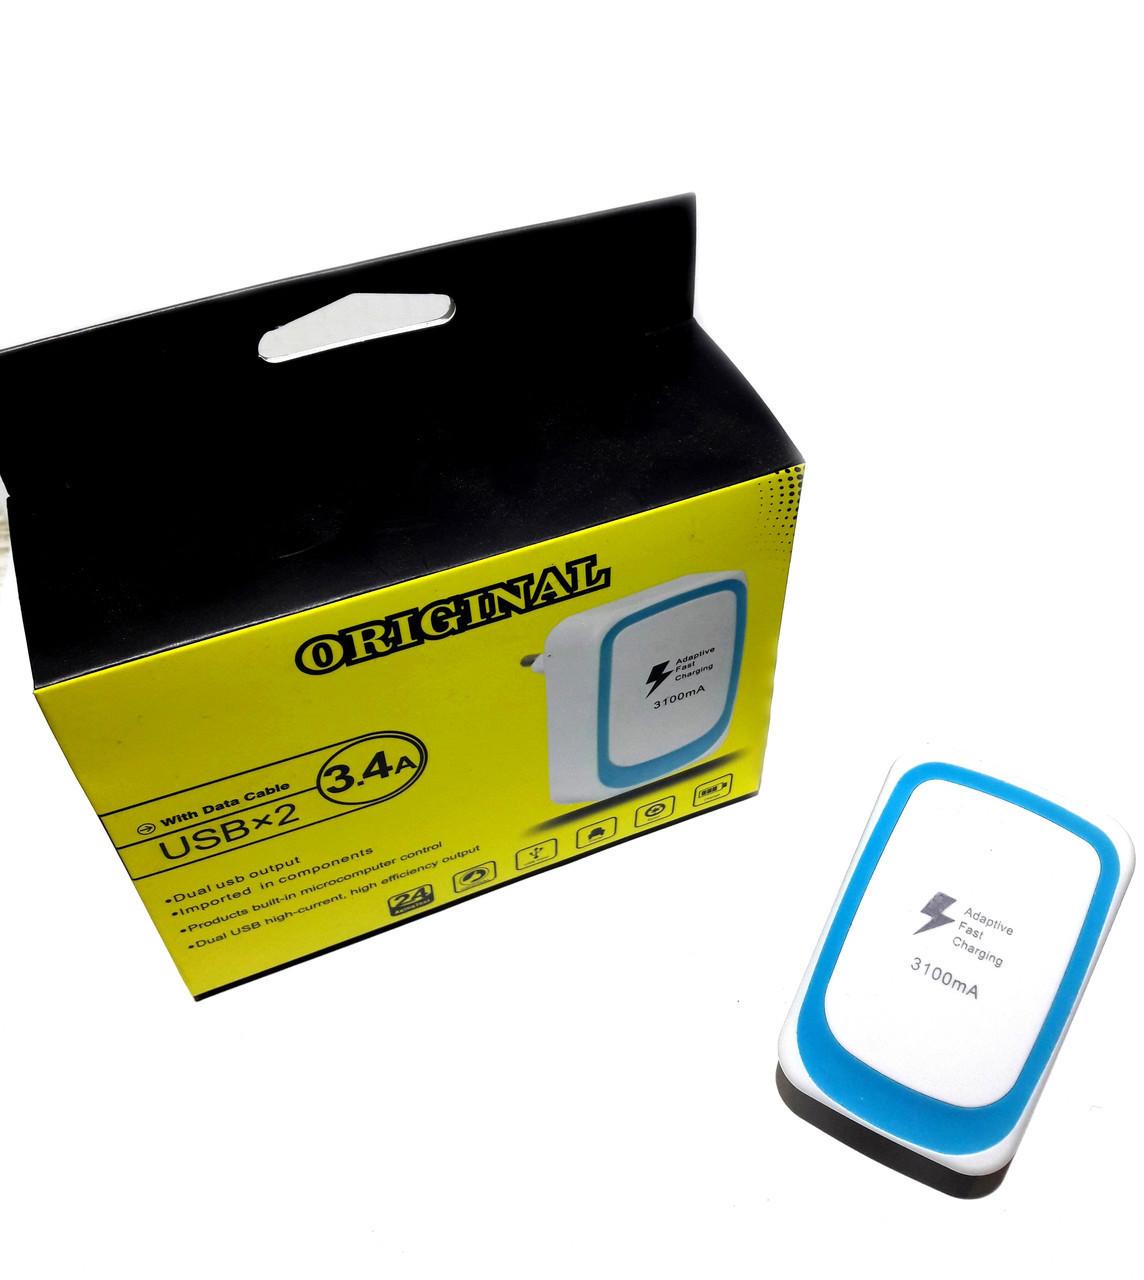 Зарядное устройство Original 3.4A USBx2 keke-f9c